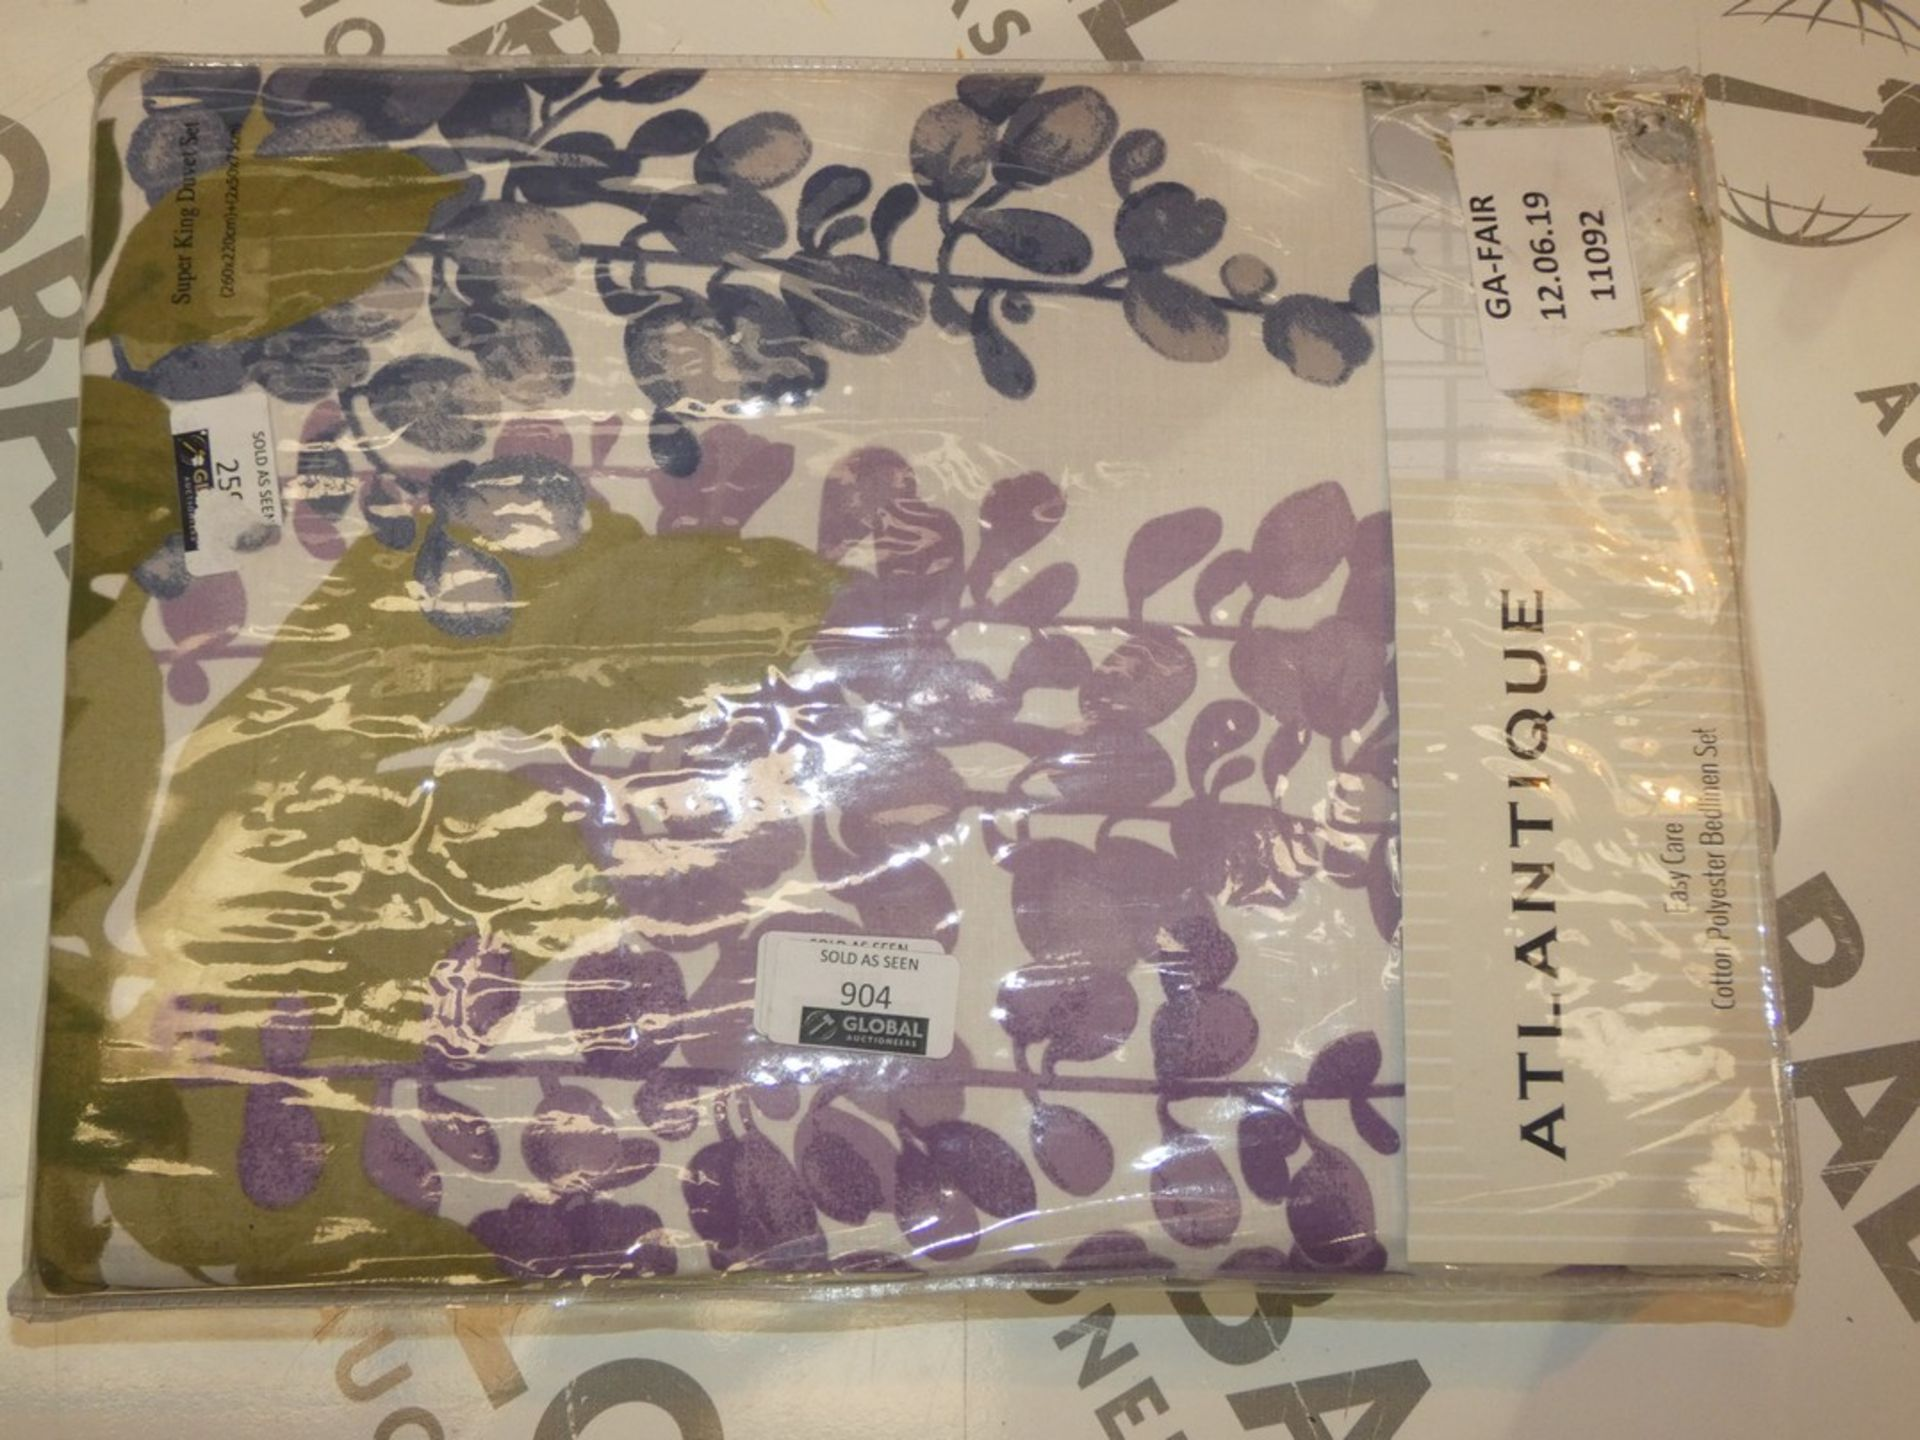 Lot 904 - Bagged Brand New Atlantique Cotton Polyester Floral Print Bed Linen Set RRP £50 (11092) (Public